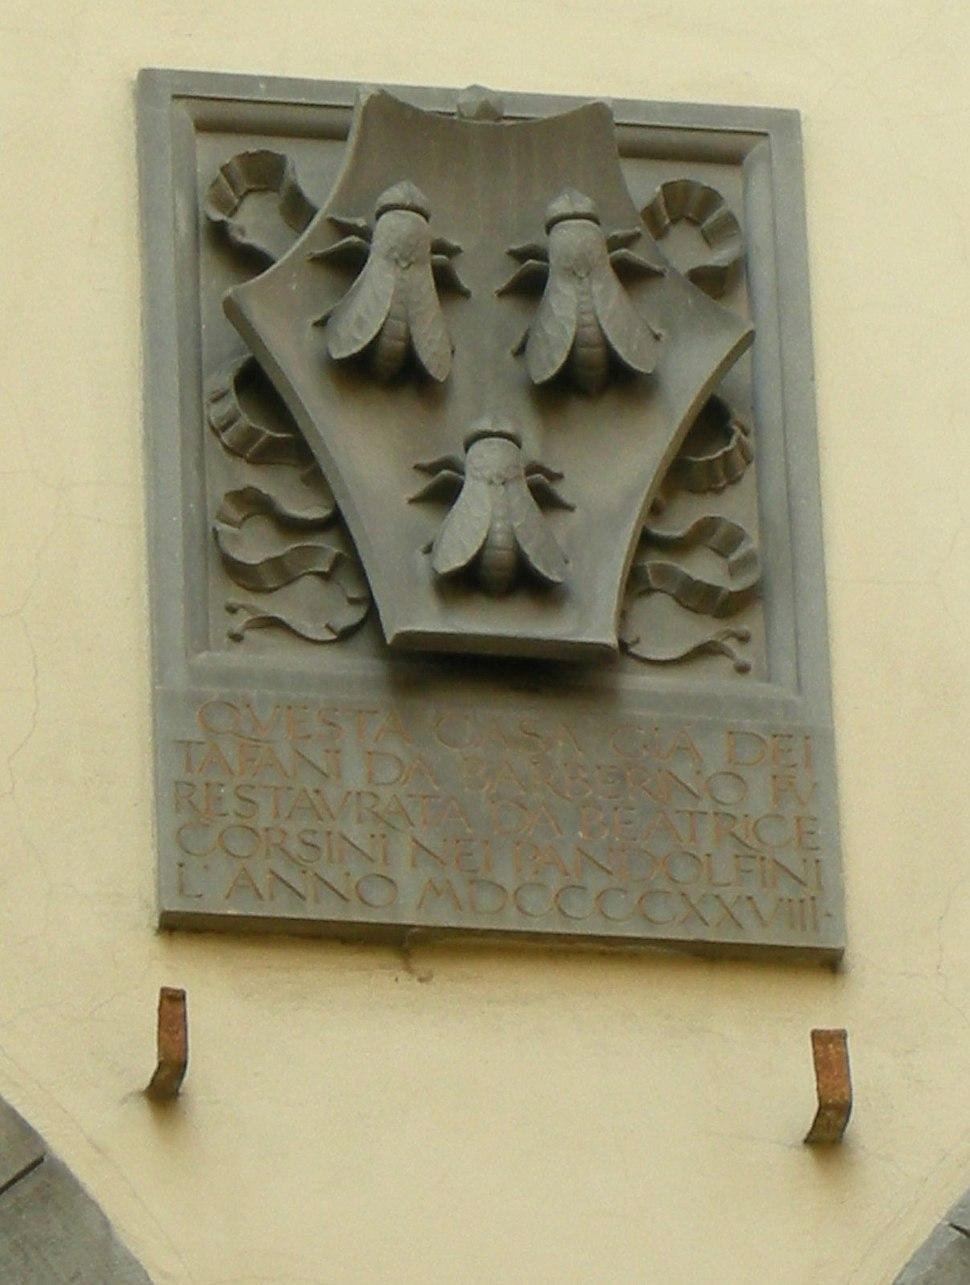 Palazzo Tafani da Barberino, stemma barberini